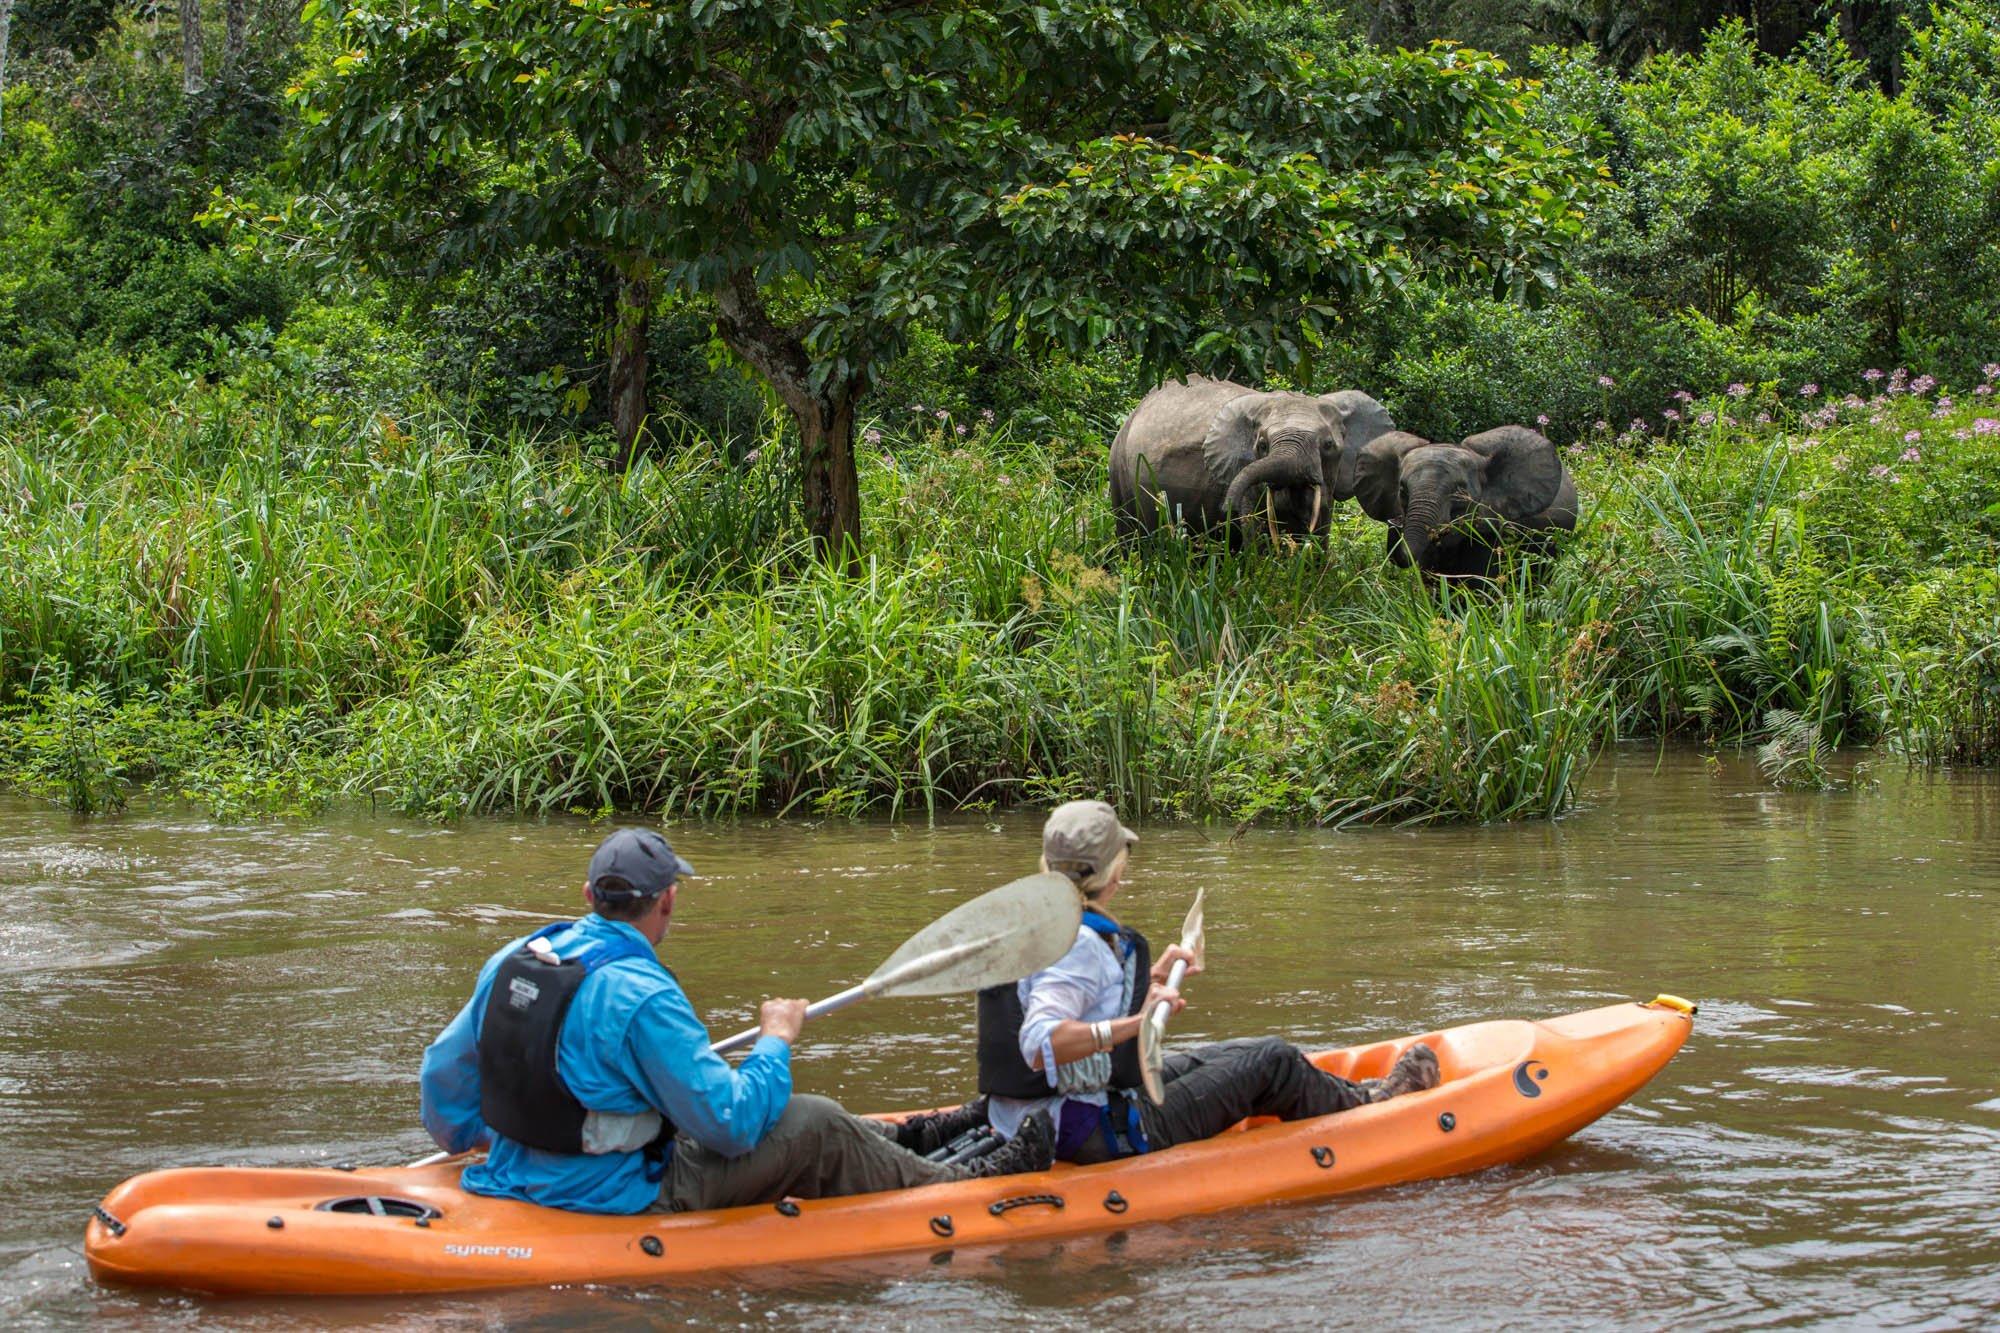 Kayak Africa, Travel Africa, Africa Safari Guide, Luxury African Safari